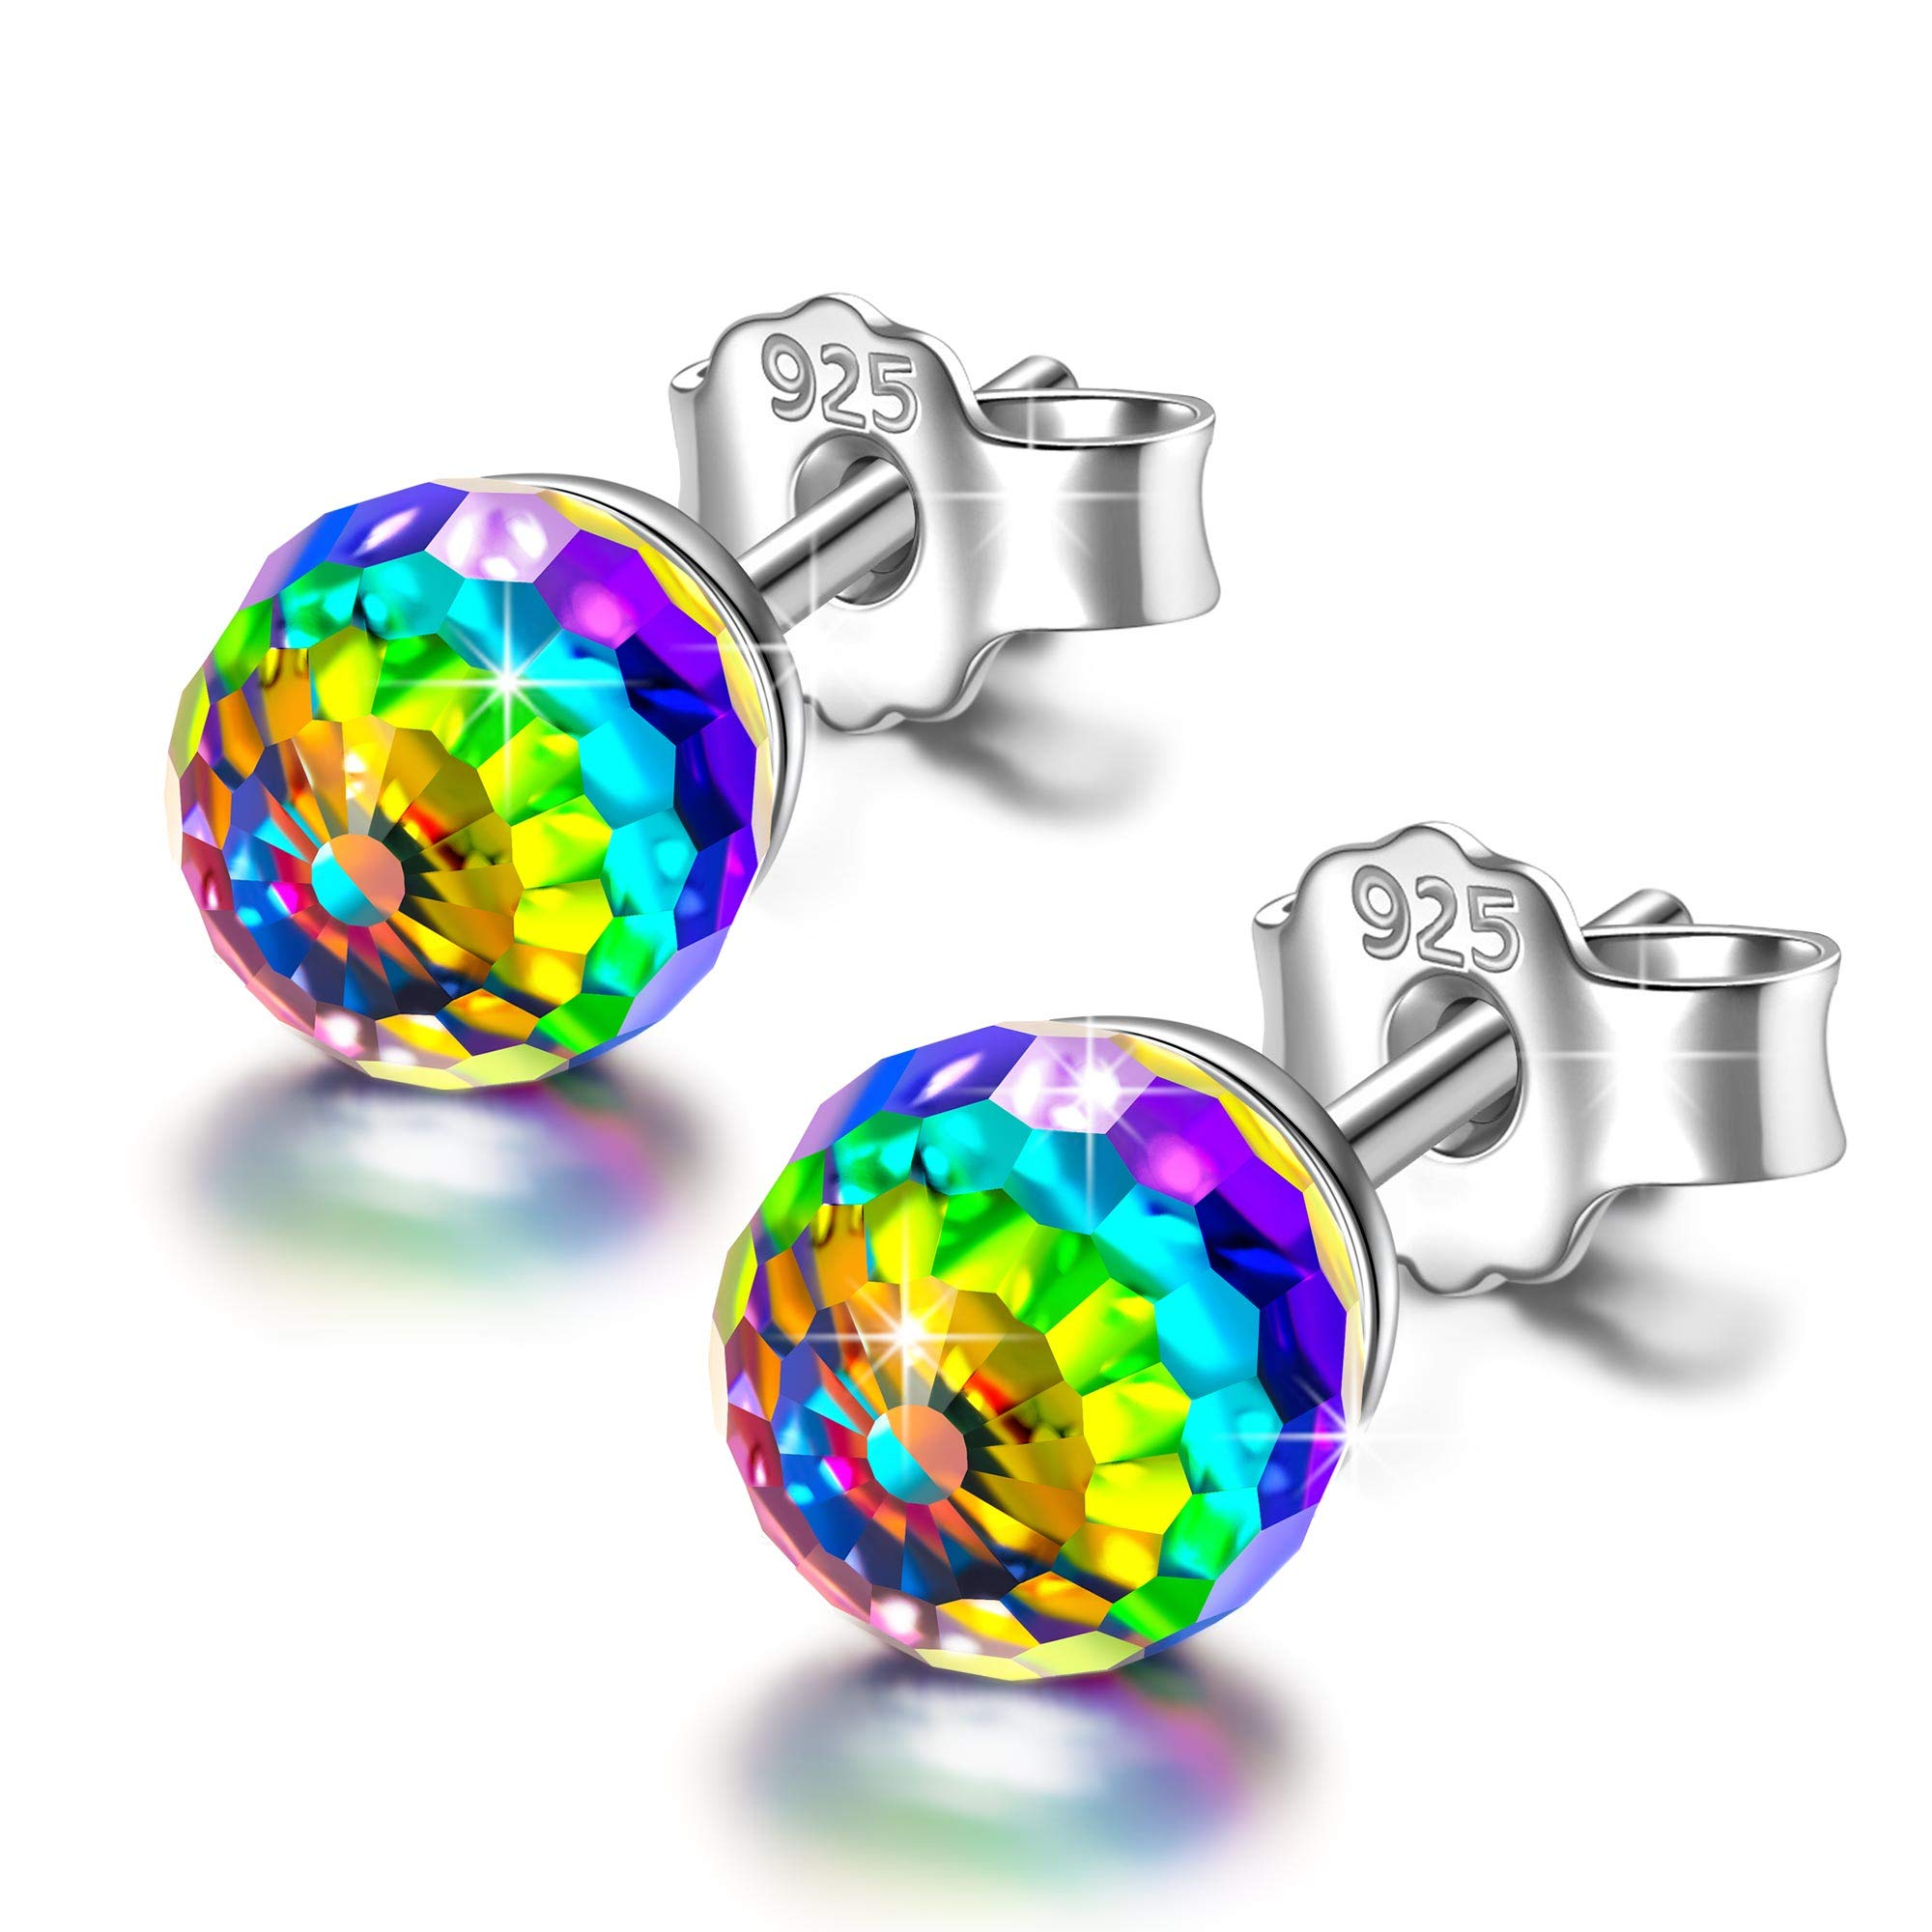 stud earrings for women girls swarovski earrings for teen girls daughter valentines anniversary gift for wife girlfriend birthday gifts for mom sister crystals earrings jewelry love wedding present